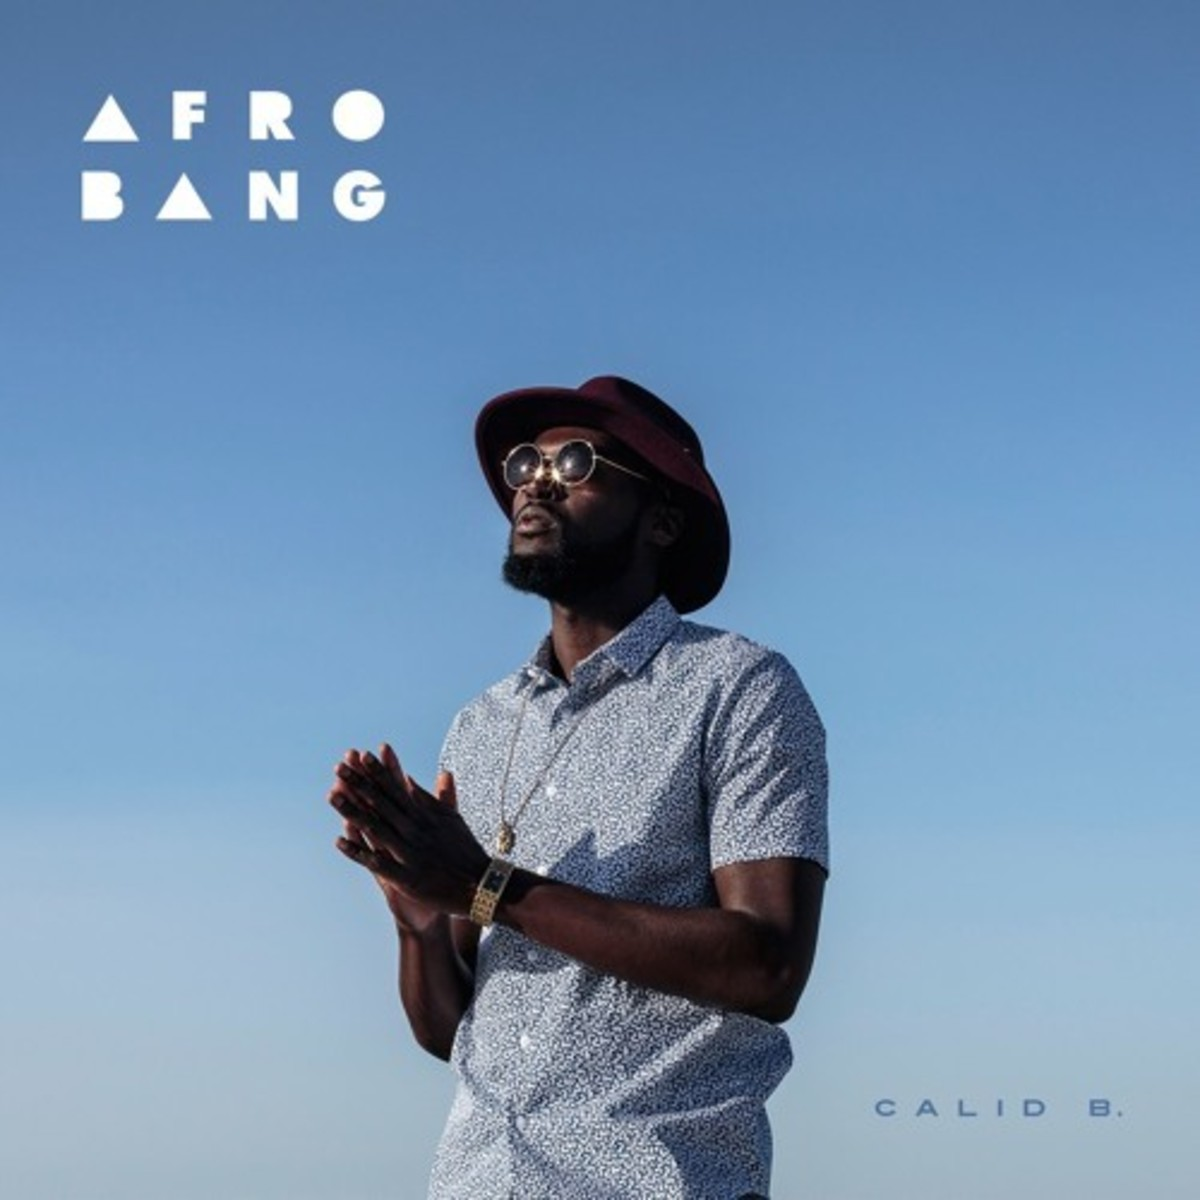 calid-b-afro-bang.jpg